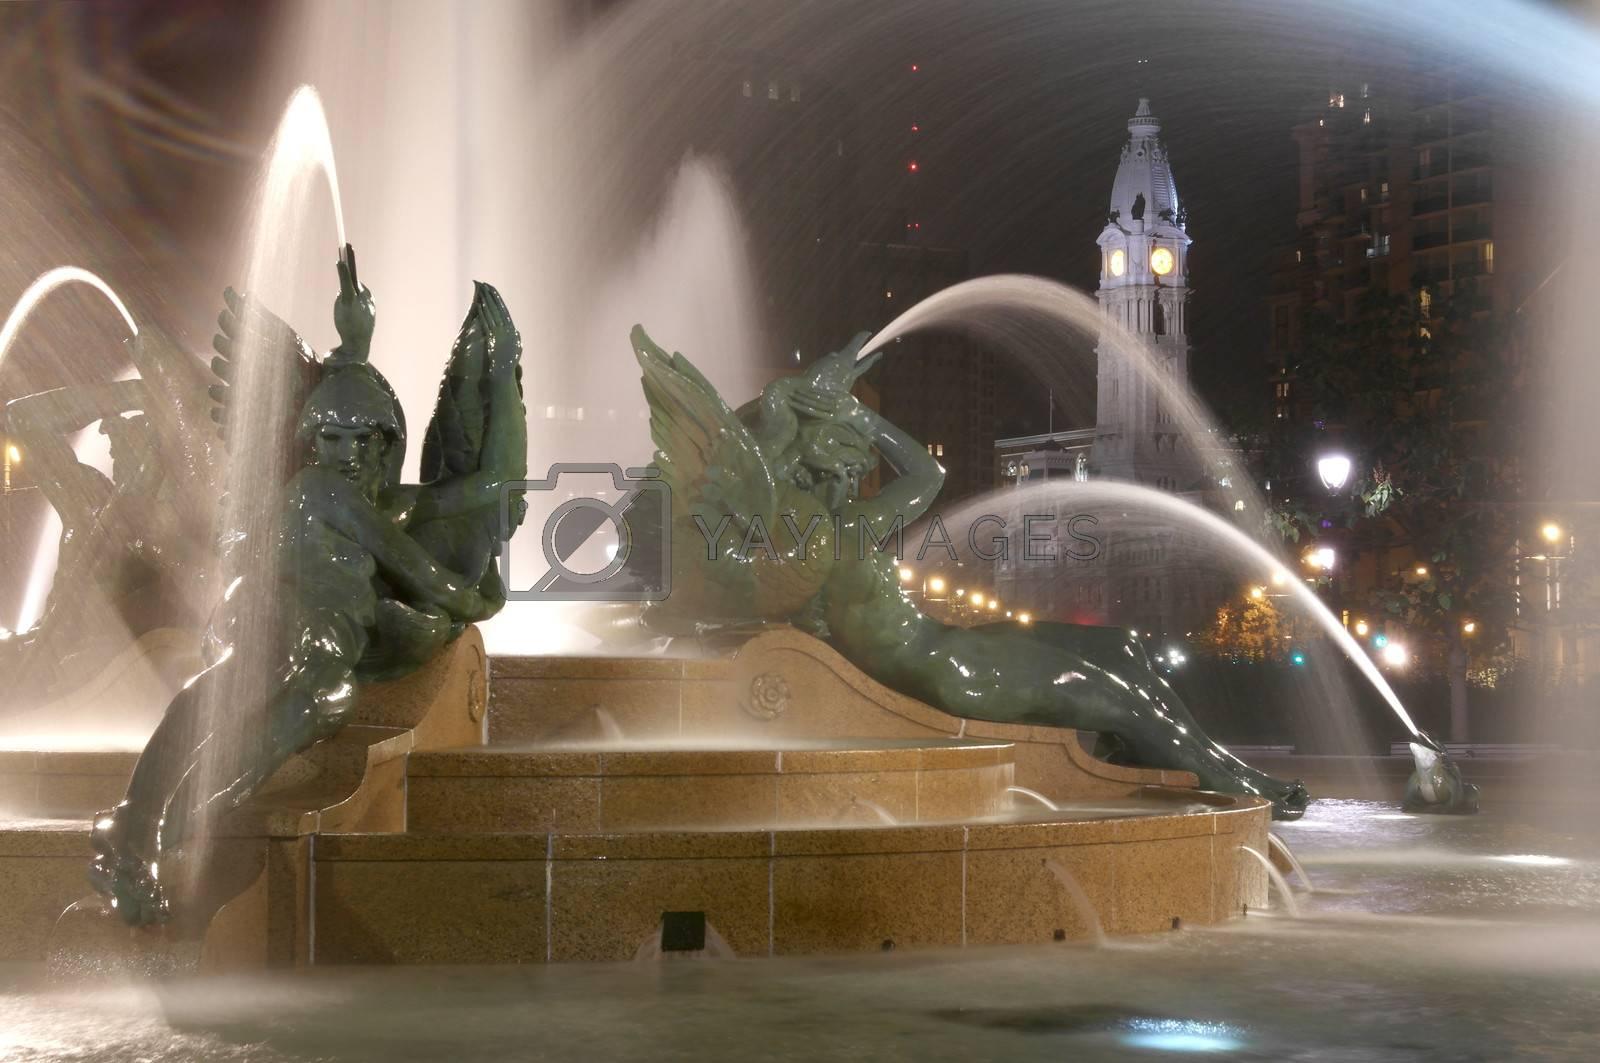 Swann memorial fountain in downtown Philadelphia at night